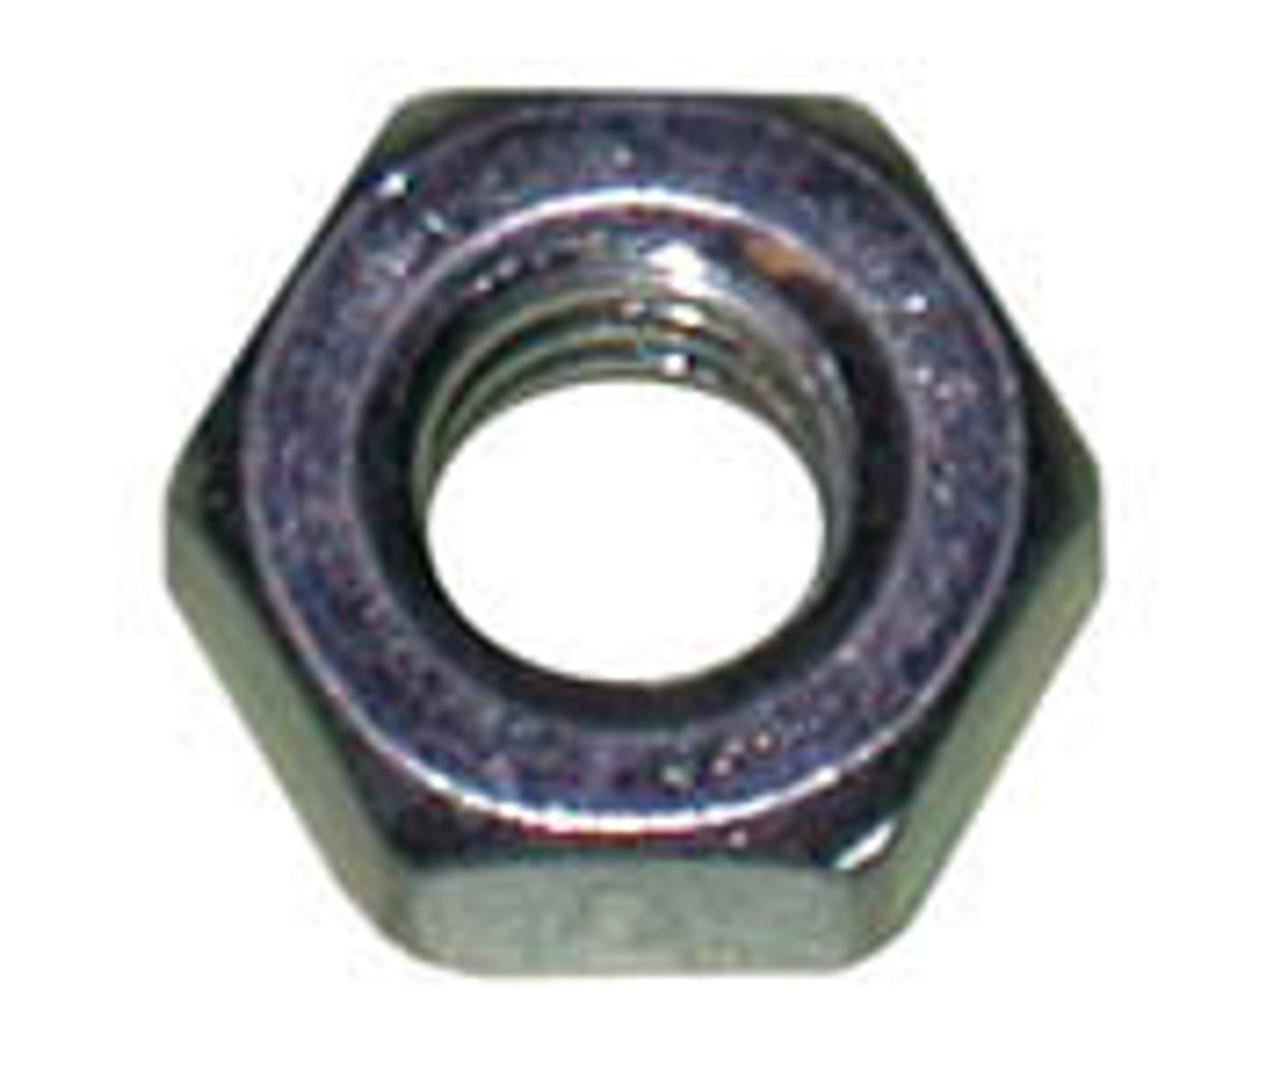 HN14G5ZC --- Demco Nut for Holding Master Cylinder